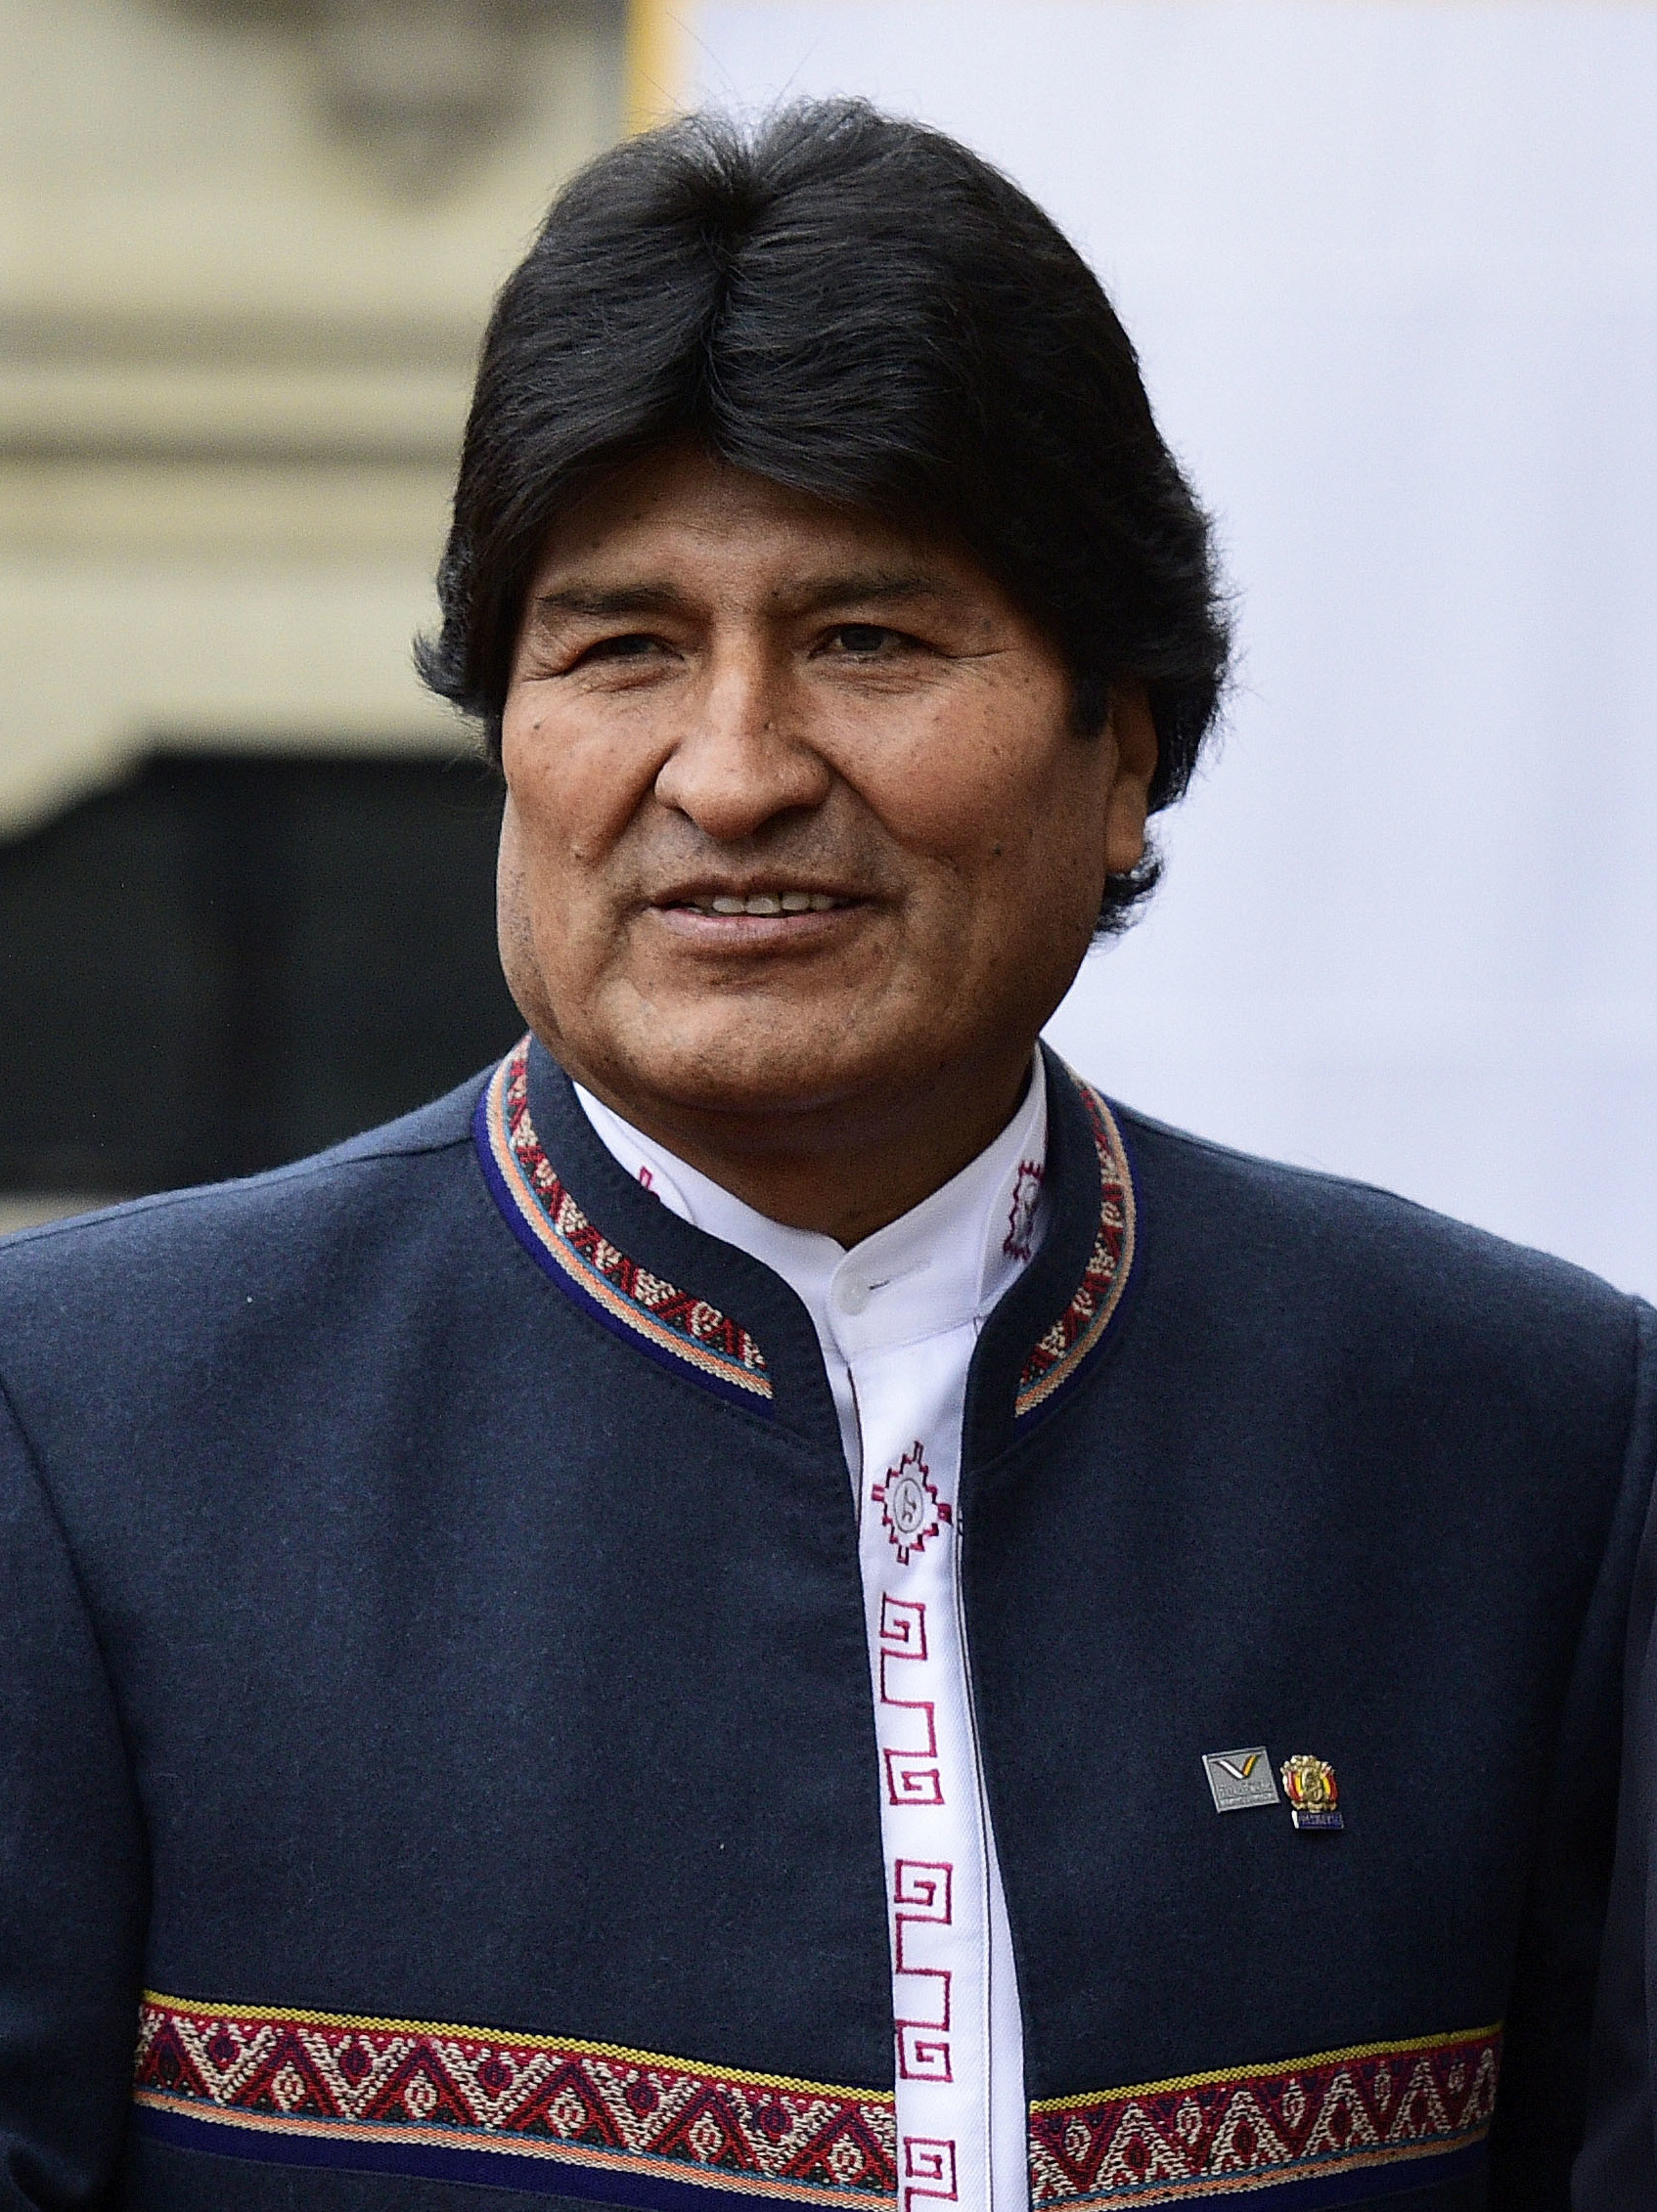 https://upload.wikimedia.org/wikipedia/commons/5/51/Presidentes_del_Per%C3%BA_y_Bolivia_inauguran_Encuentro_Presidencial_y_III_Gabinete_Binacional_Per%C3%BA-Bolivia_%2836962597345%29_%28cropped%29.jpg